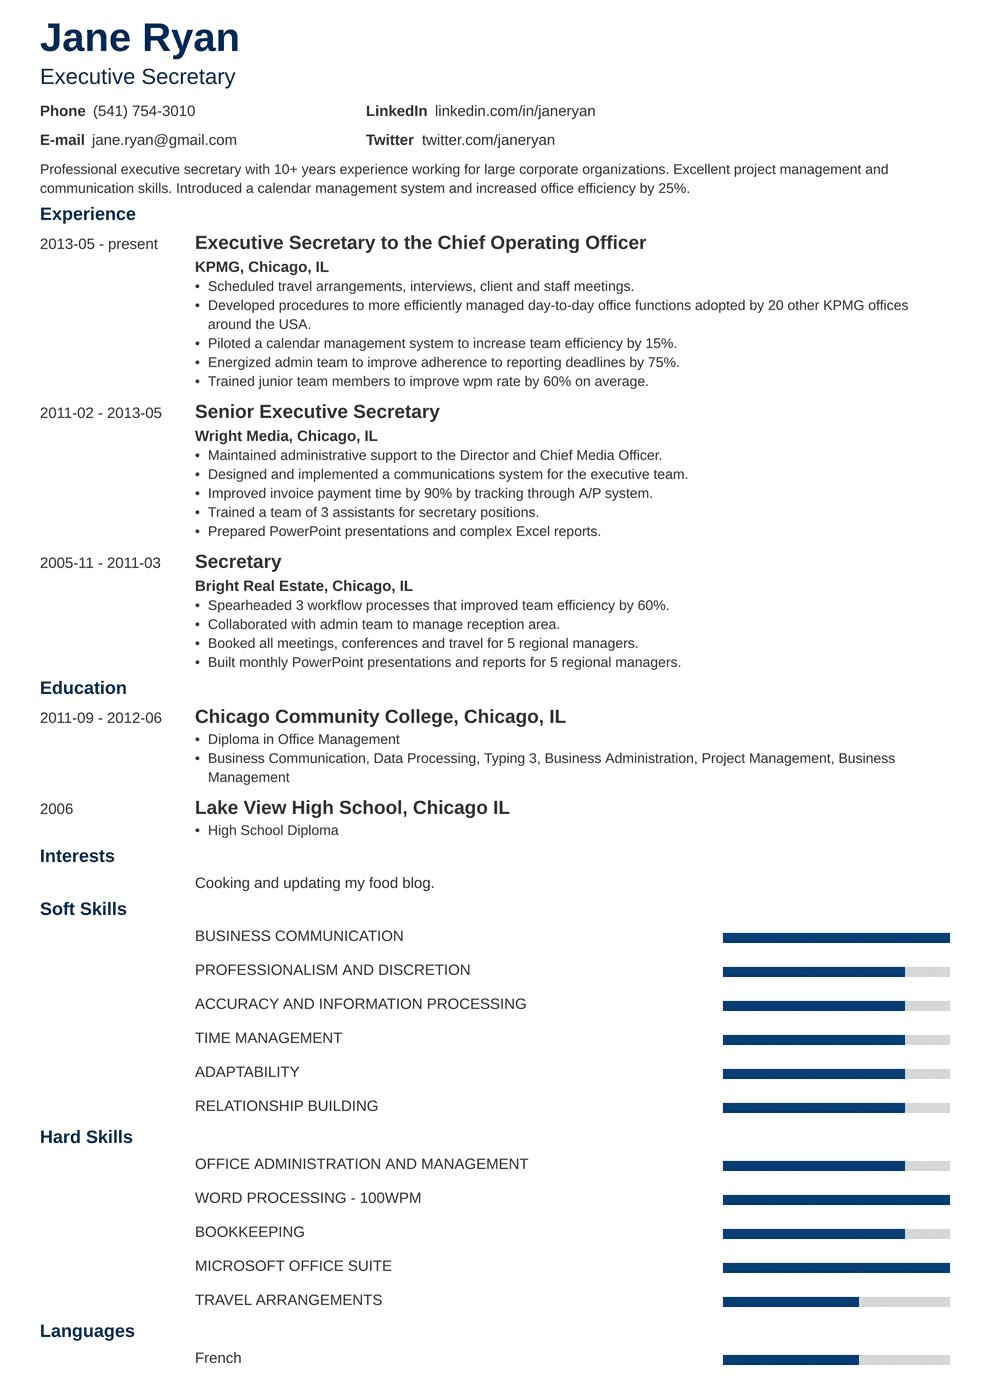 secretary resume template minimo in 2020 Resume template